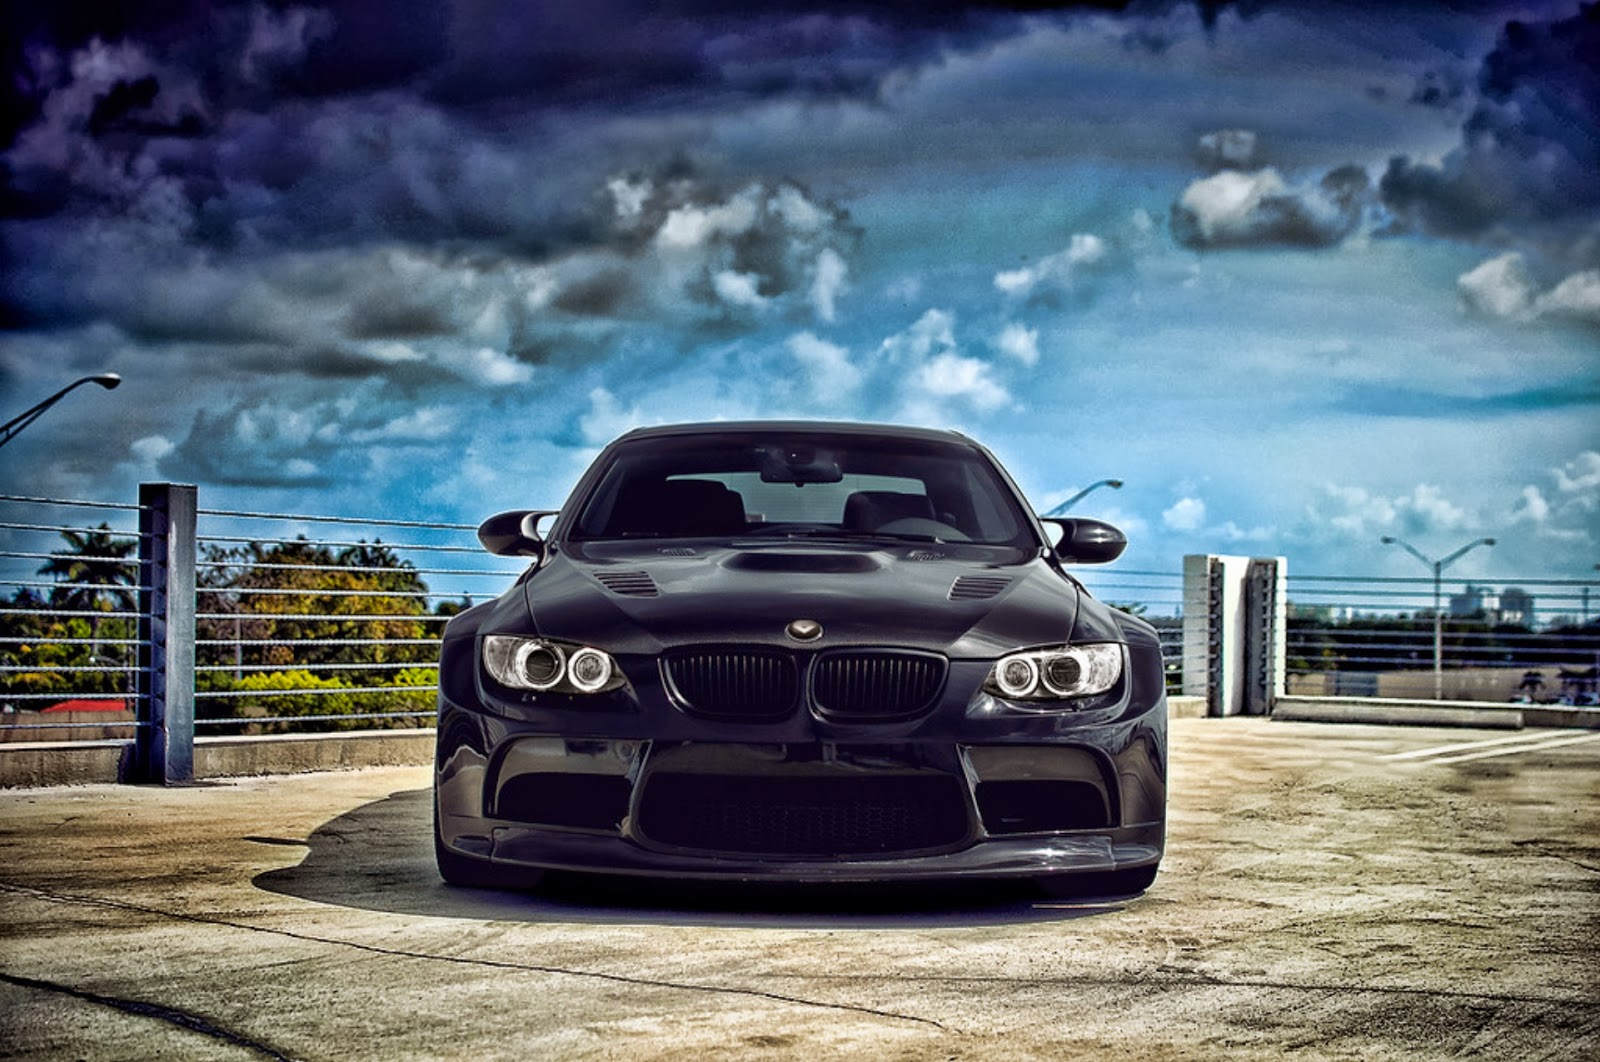 49+ BMW M3 Wallpaper HD Widescreen on WallpaperSafari